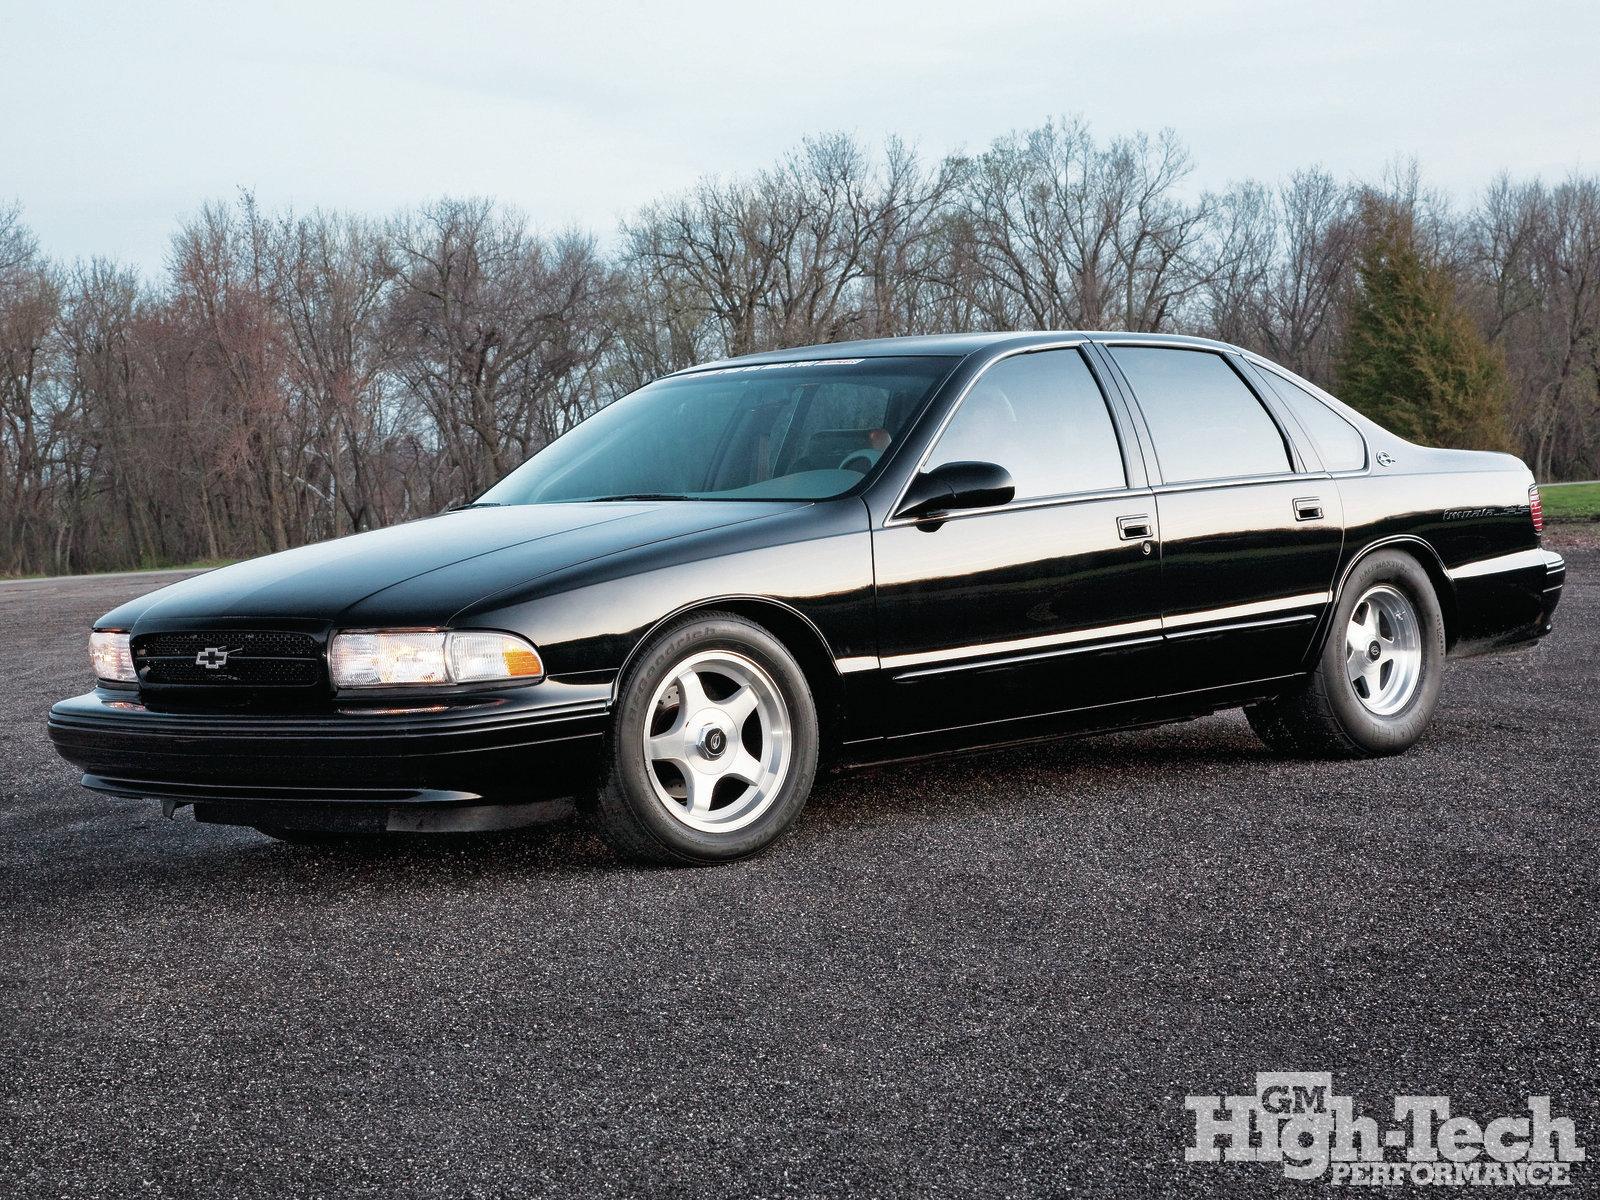 96 Caprice Engine Diagram Wiring Library Impala Ss Chevrolet Sedan 1996